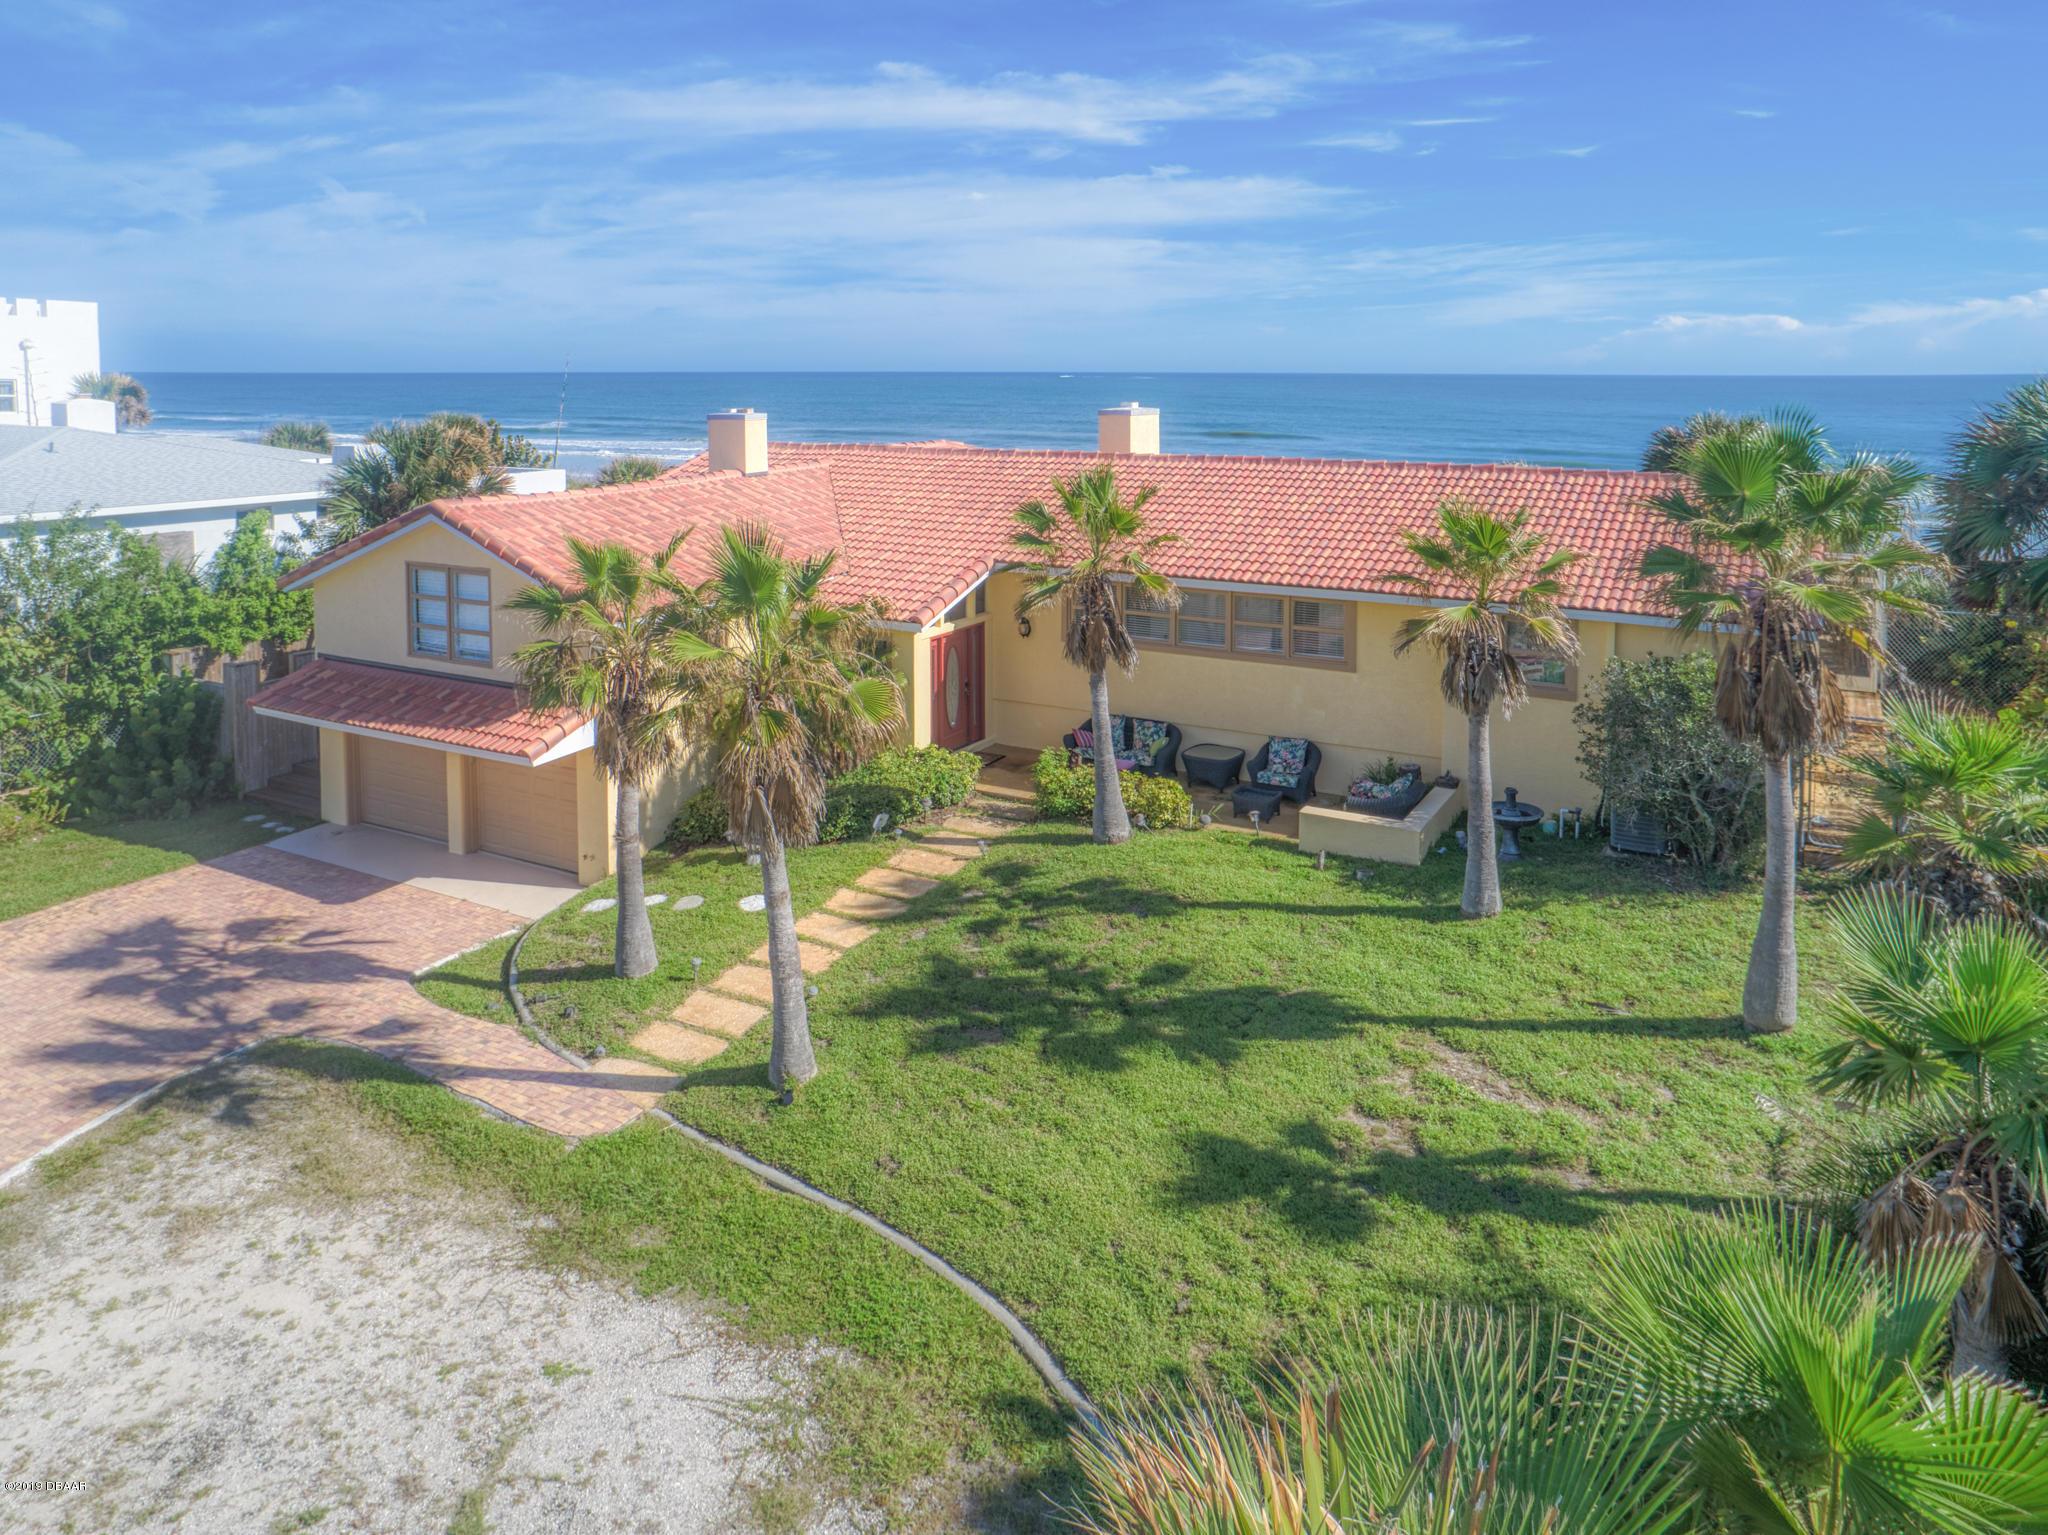 Photo of 2843 S Atlantic Avenue, Daytona Beach Shores, FL 32118